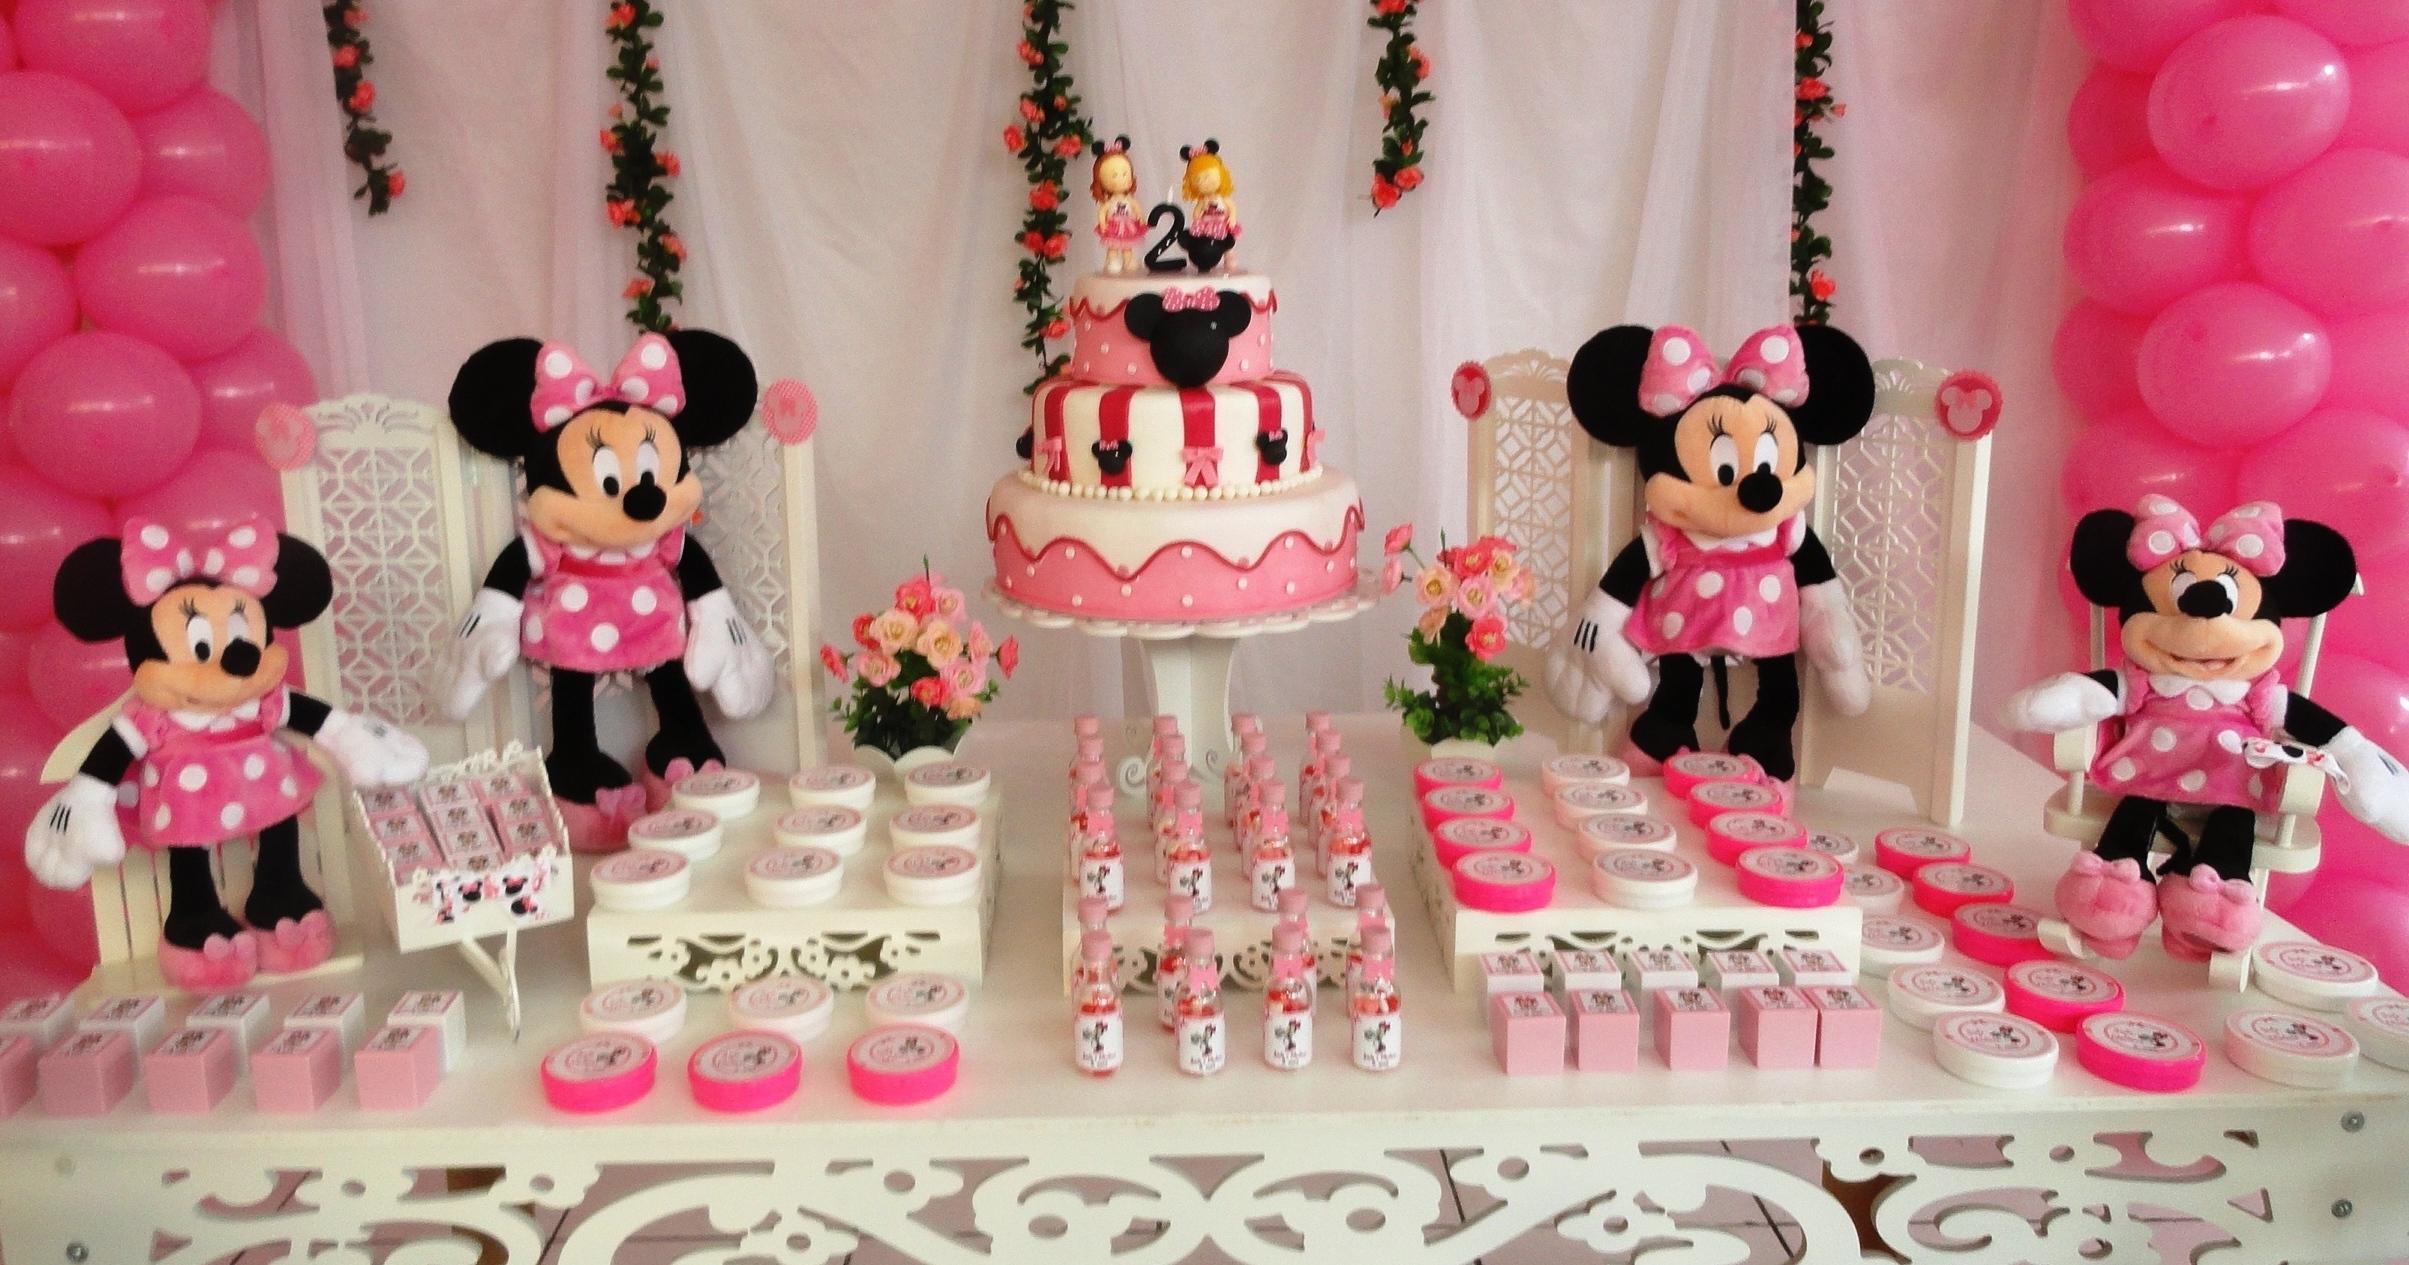 decoracao festa minnie rosa : decoracao festa minnie rosa:Da Minnie Rosa Decoracao Para Festas